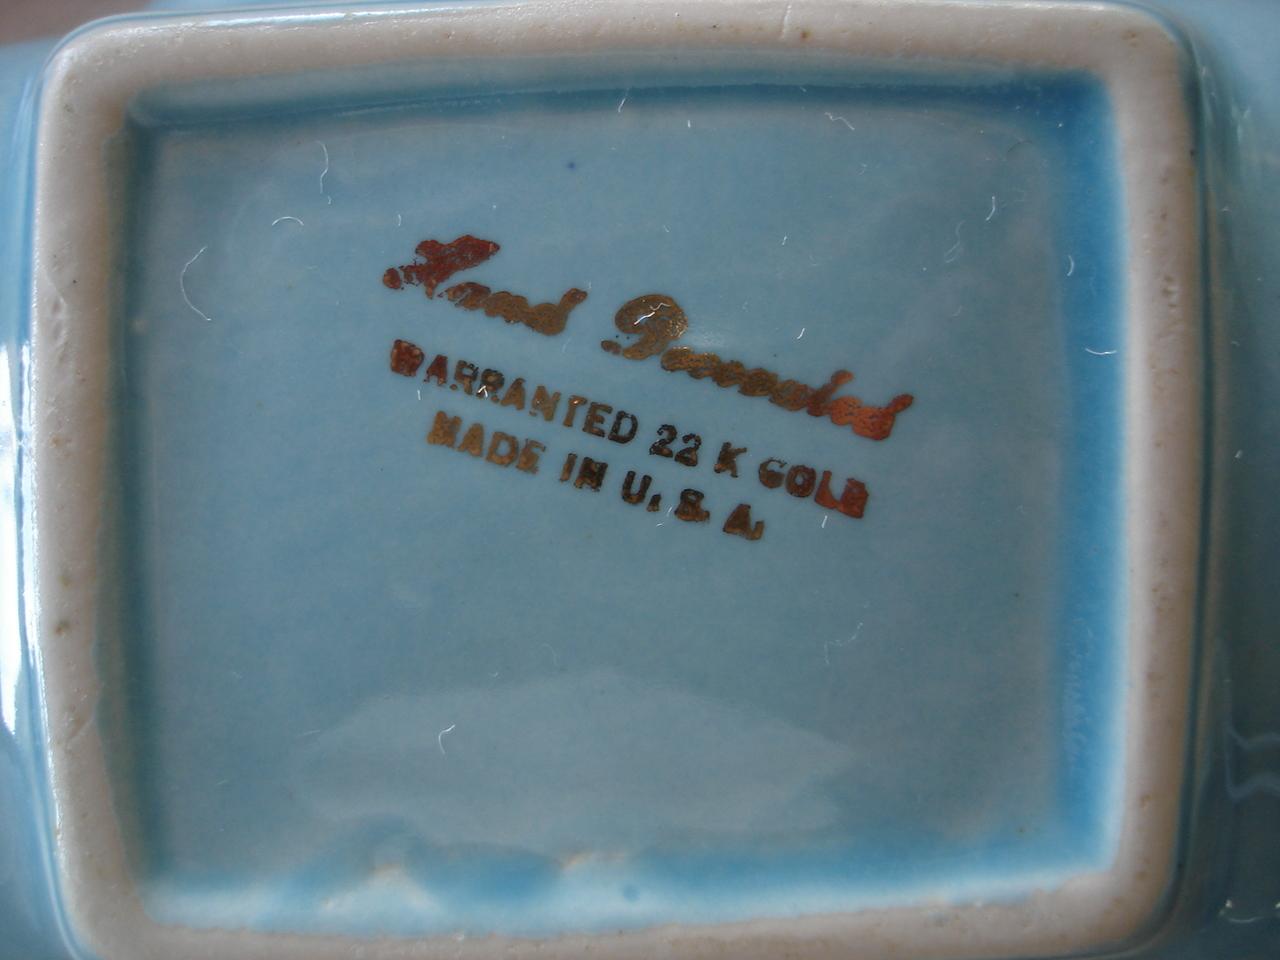 Vintage Sky Blue Ceramic Bowl Dish, 22K Gold Trim, USA